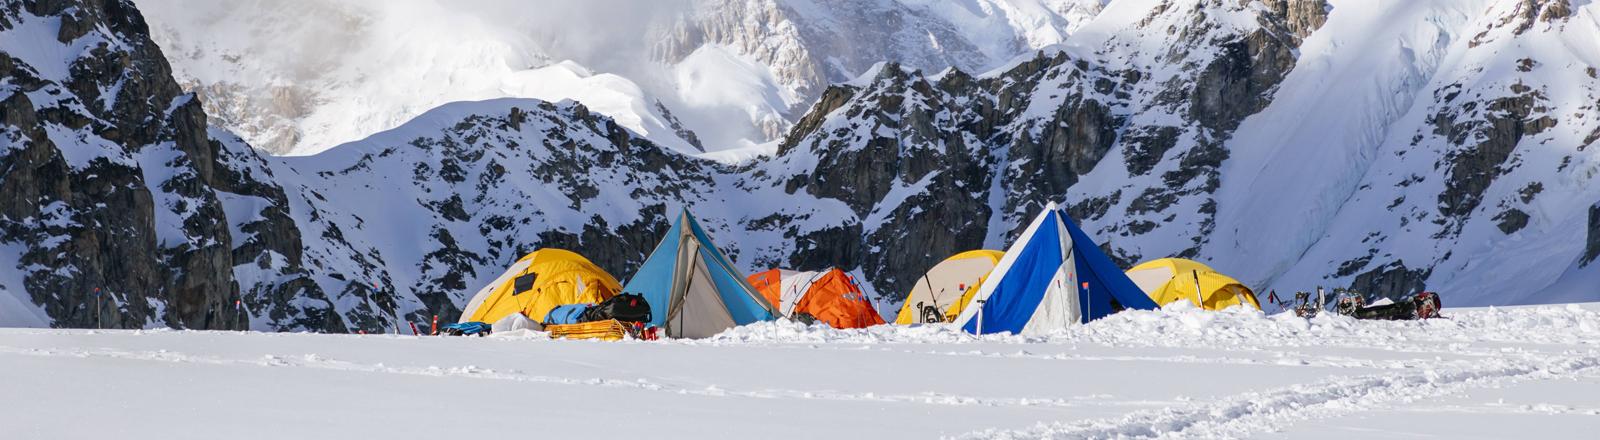 Zelt-Camp am Denali